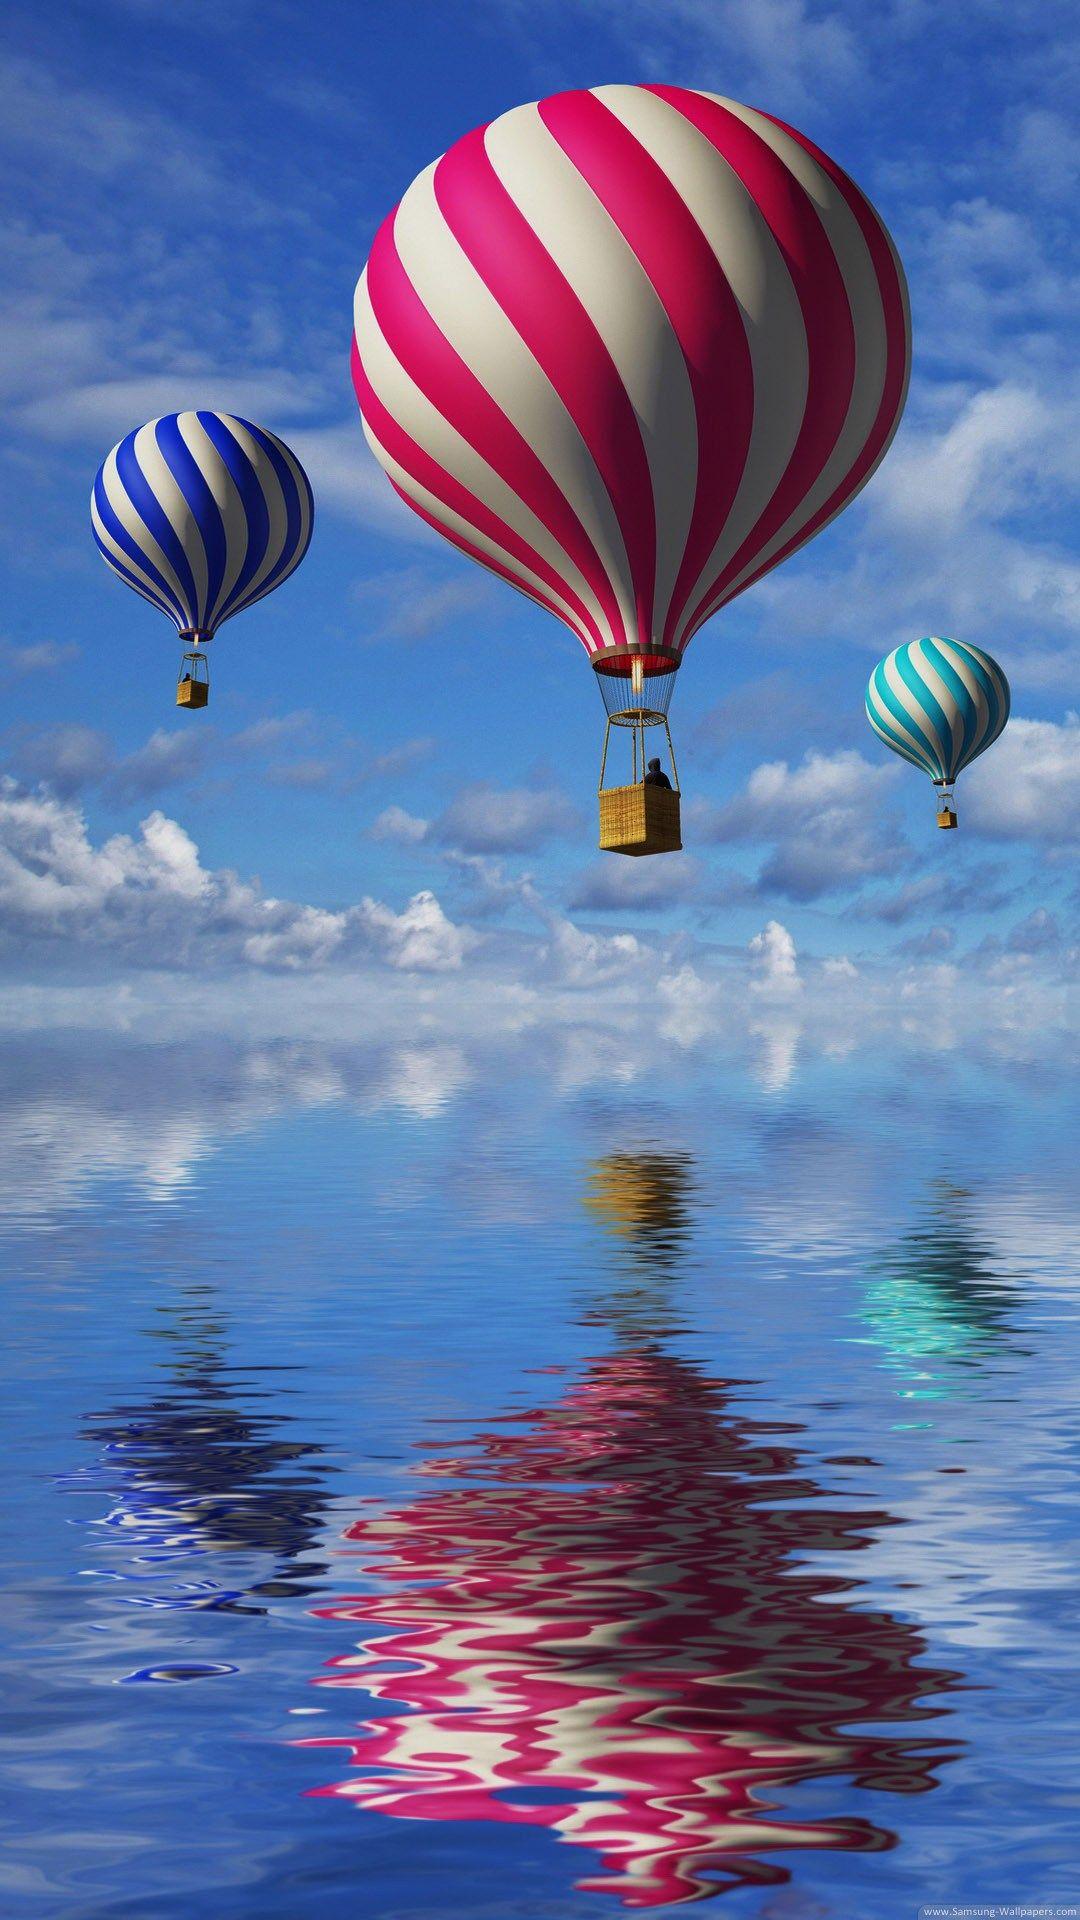 Miui Home Screen Wallpapers Source Miui Posted Advent Geek Hot Air Balloon Air Balloon Rides Hot Air Balloon Rides